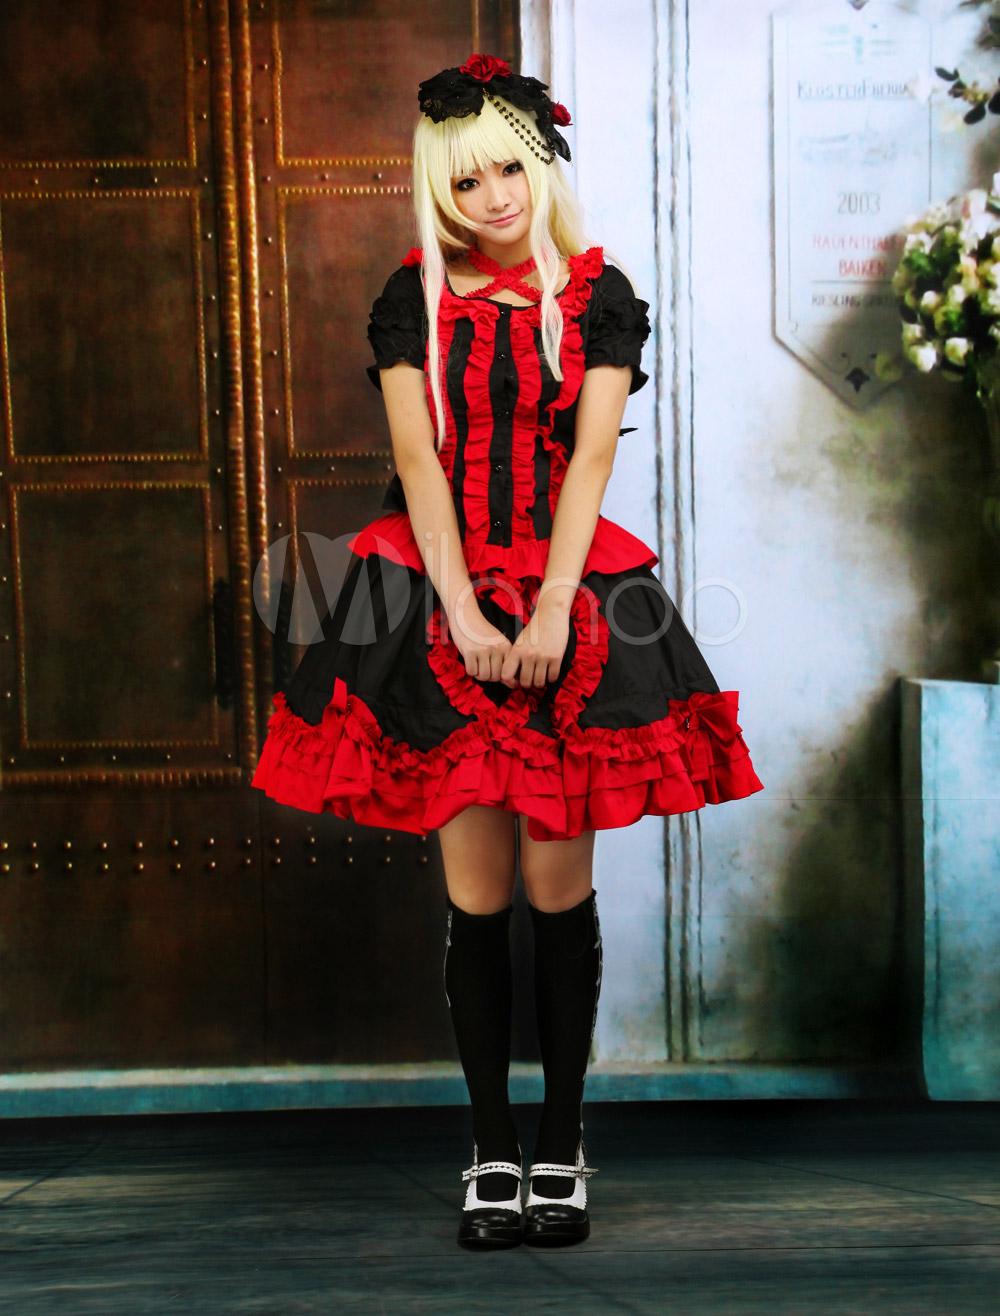 #Milanoo.com Ltd #Lolita One-Piece #Black #Short #Sleeves #Ruffle #Buttons #Cotton #Gothic #Lolita #Dress Black And Red Short Sleeves Ruffle Buttons Cotton Gothic Lolita Dress http://www.seapai.com/product.aspx?PID=5718301